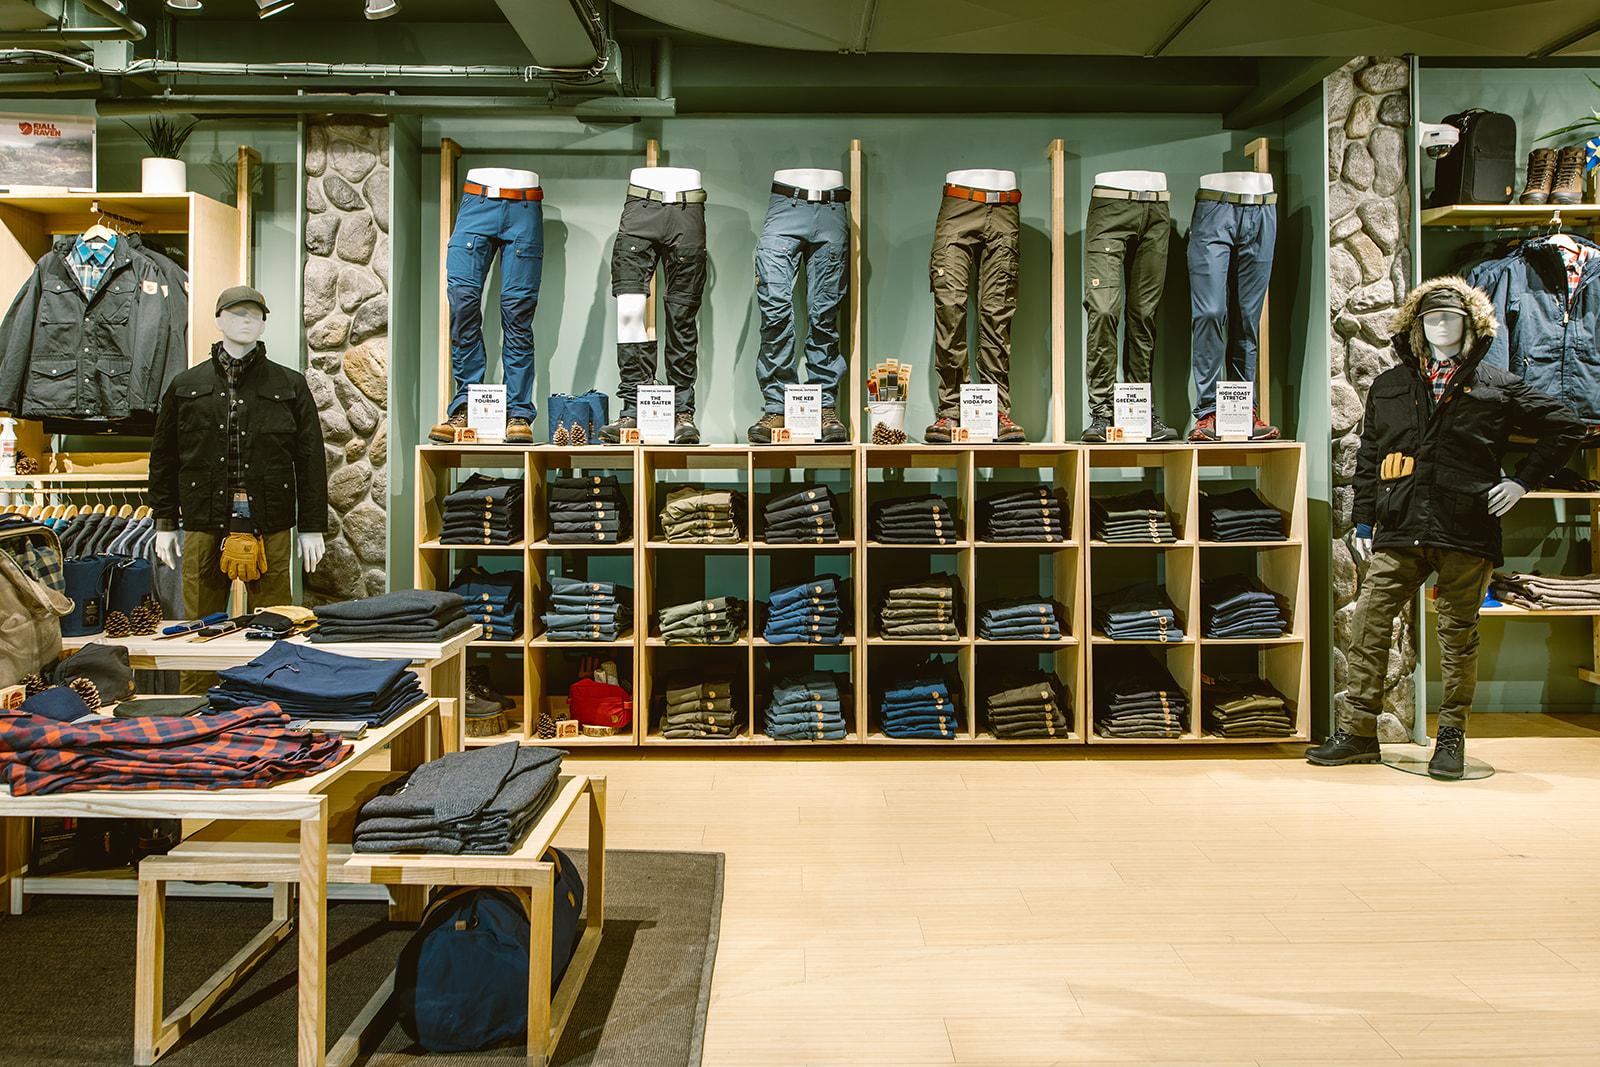 Fjallraven retailer in Banff, Alberta Store pic 3